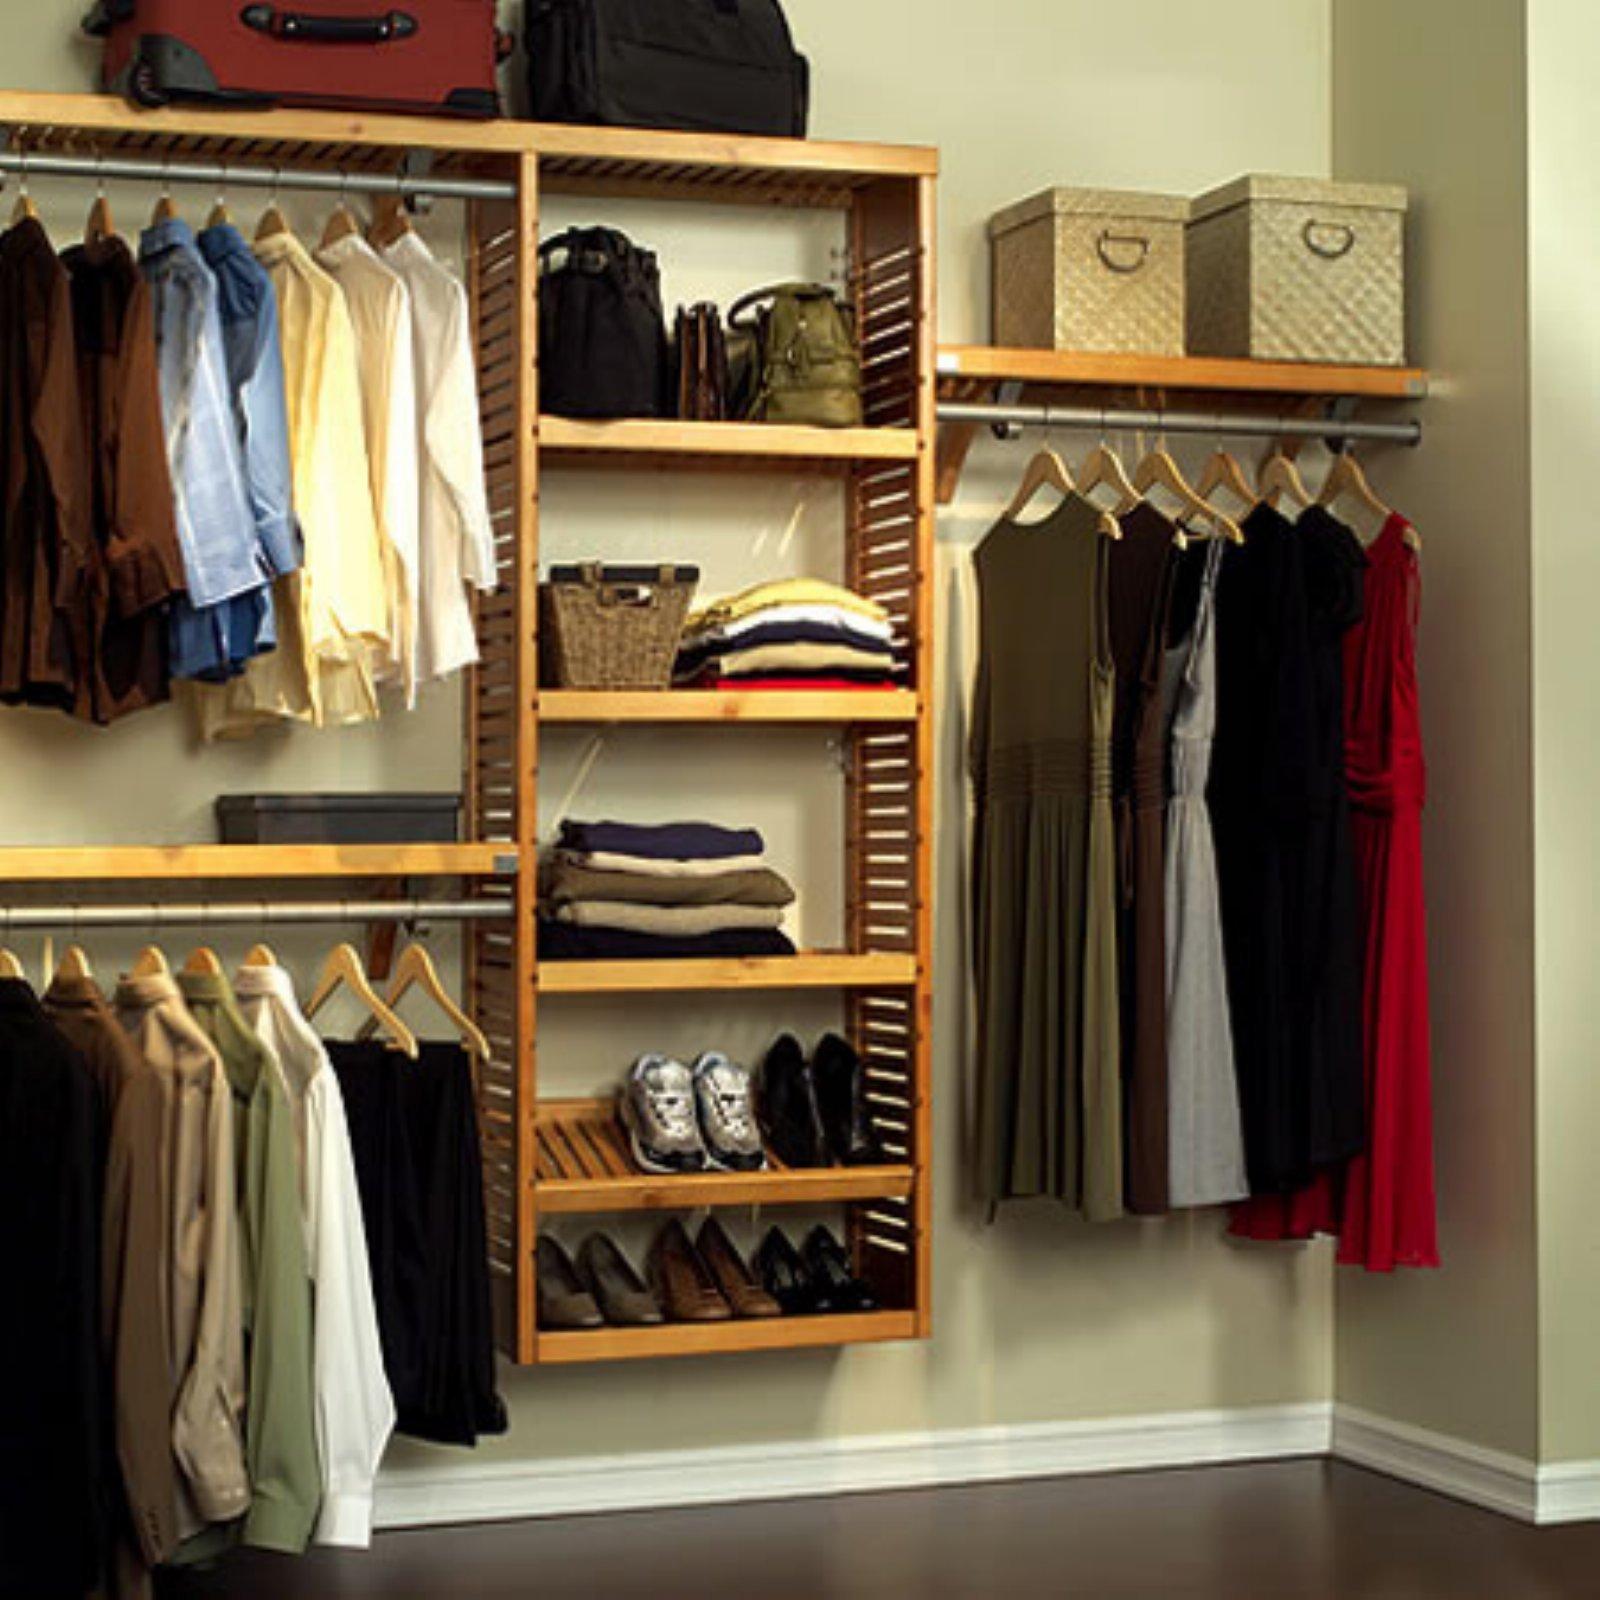 Get Quotations · John Louis Home JLH 528 Premier 12 Inch Deep Closet  Shelving System, Honey